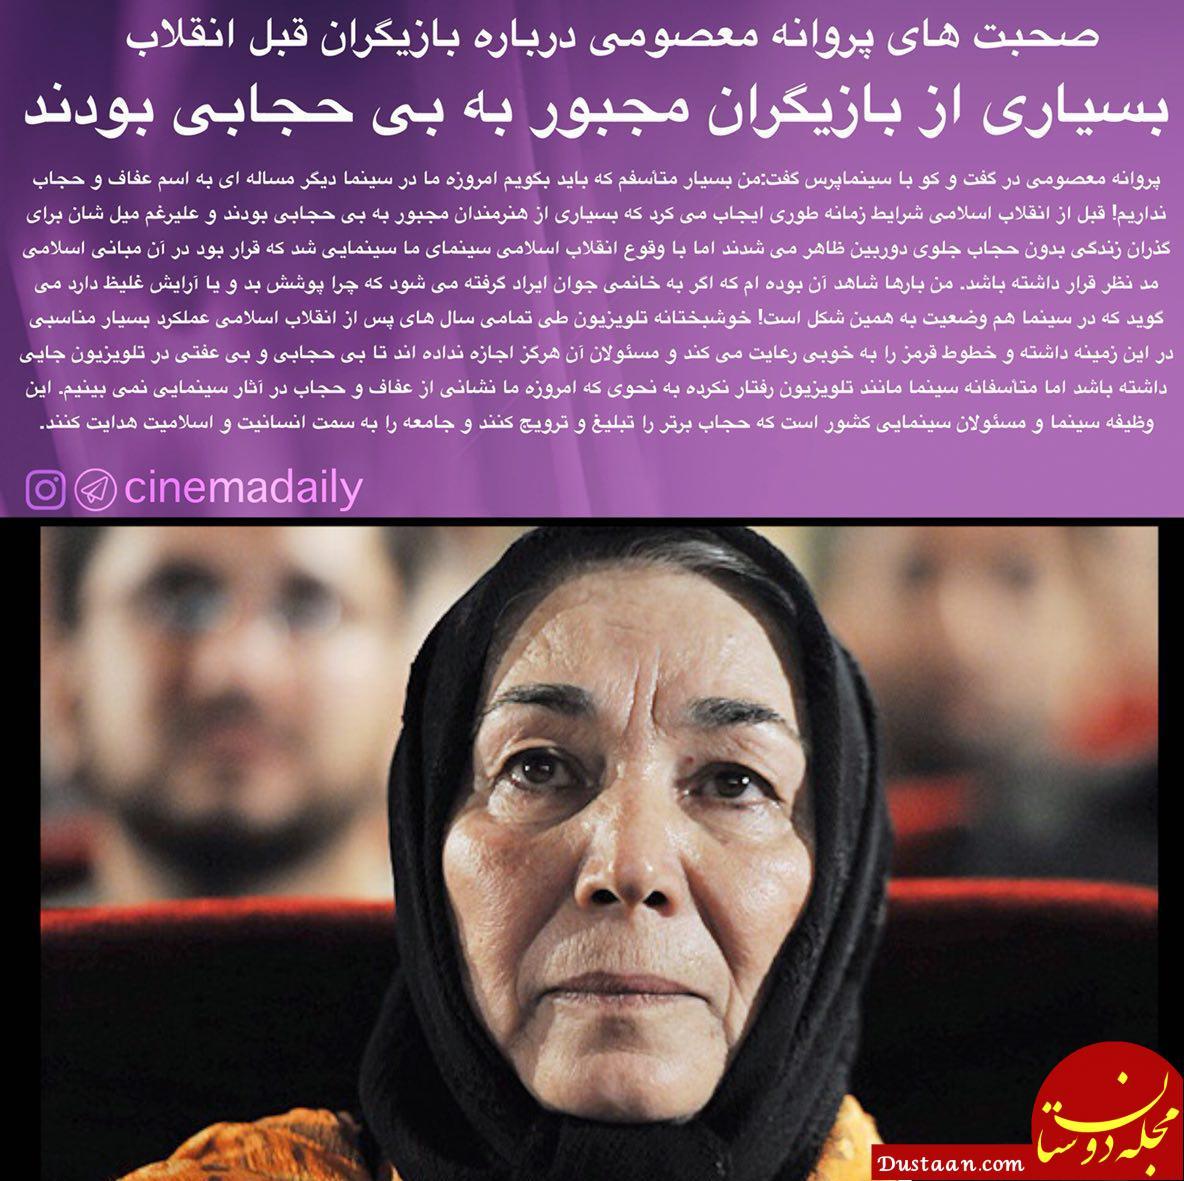 www.dustaan.com پروانه معصومی : متاسفم که امروز درسینما مساله حجاب و عفاف نداریم